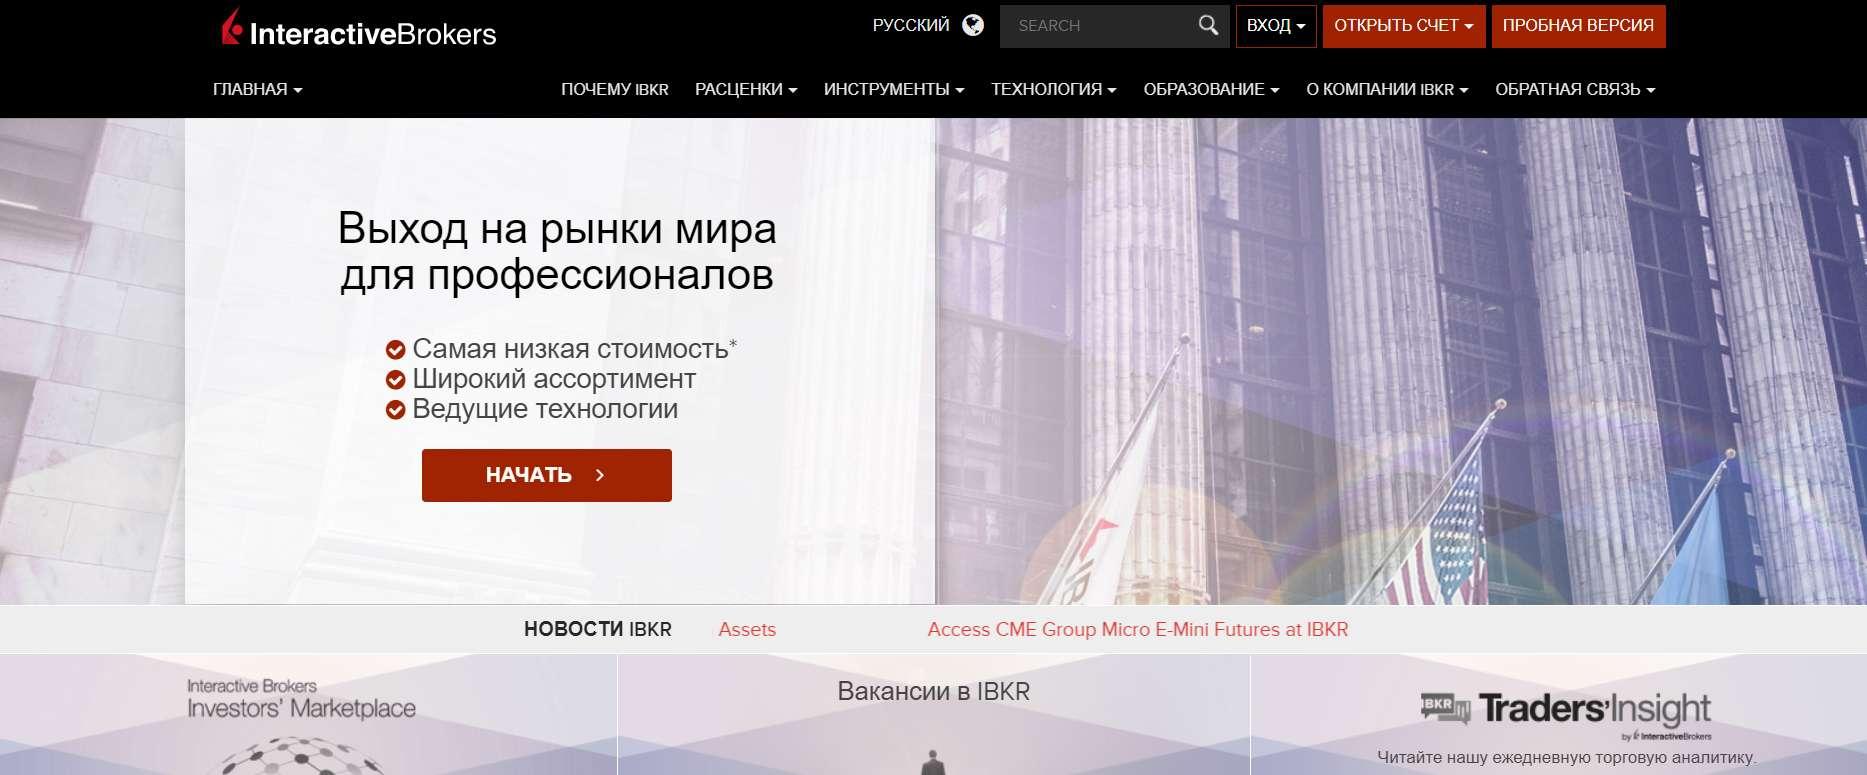 www.interactivebrokers.co